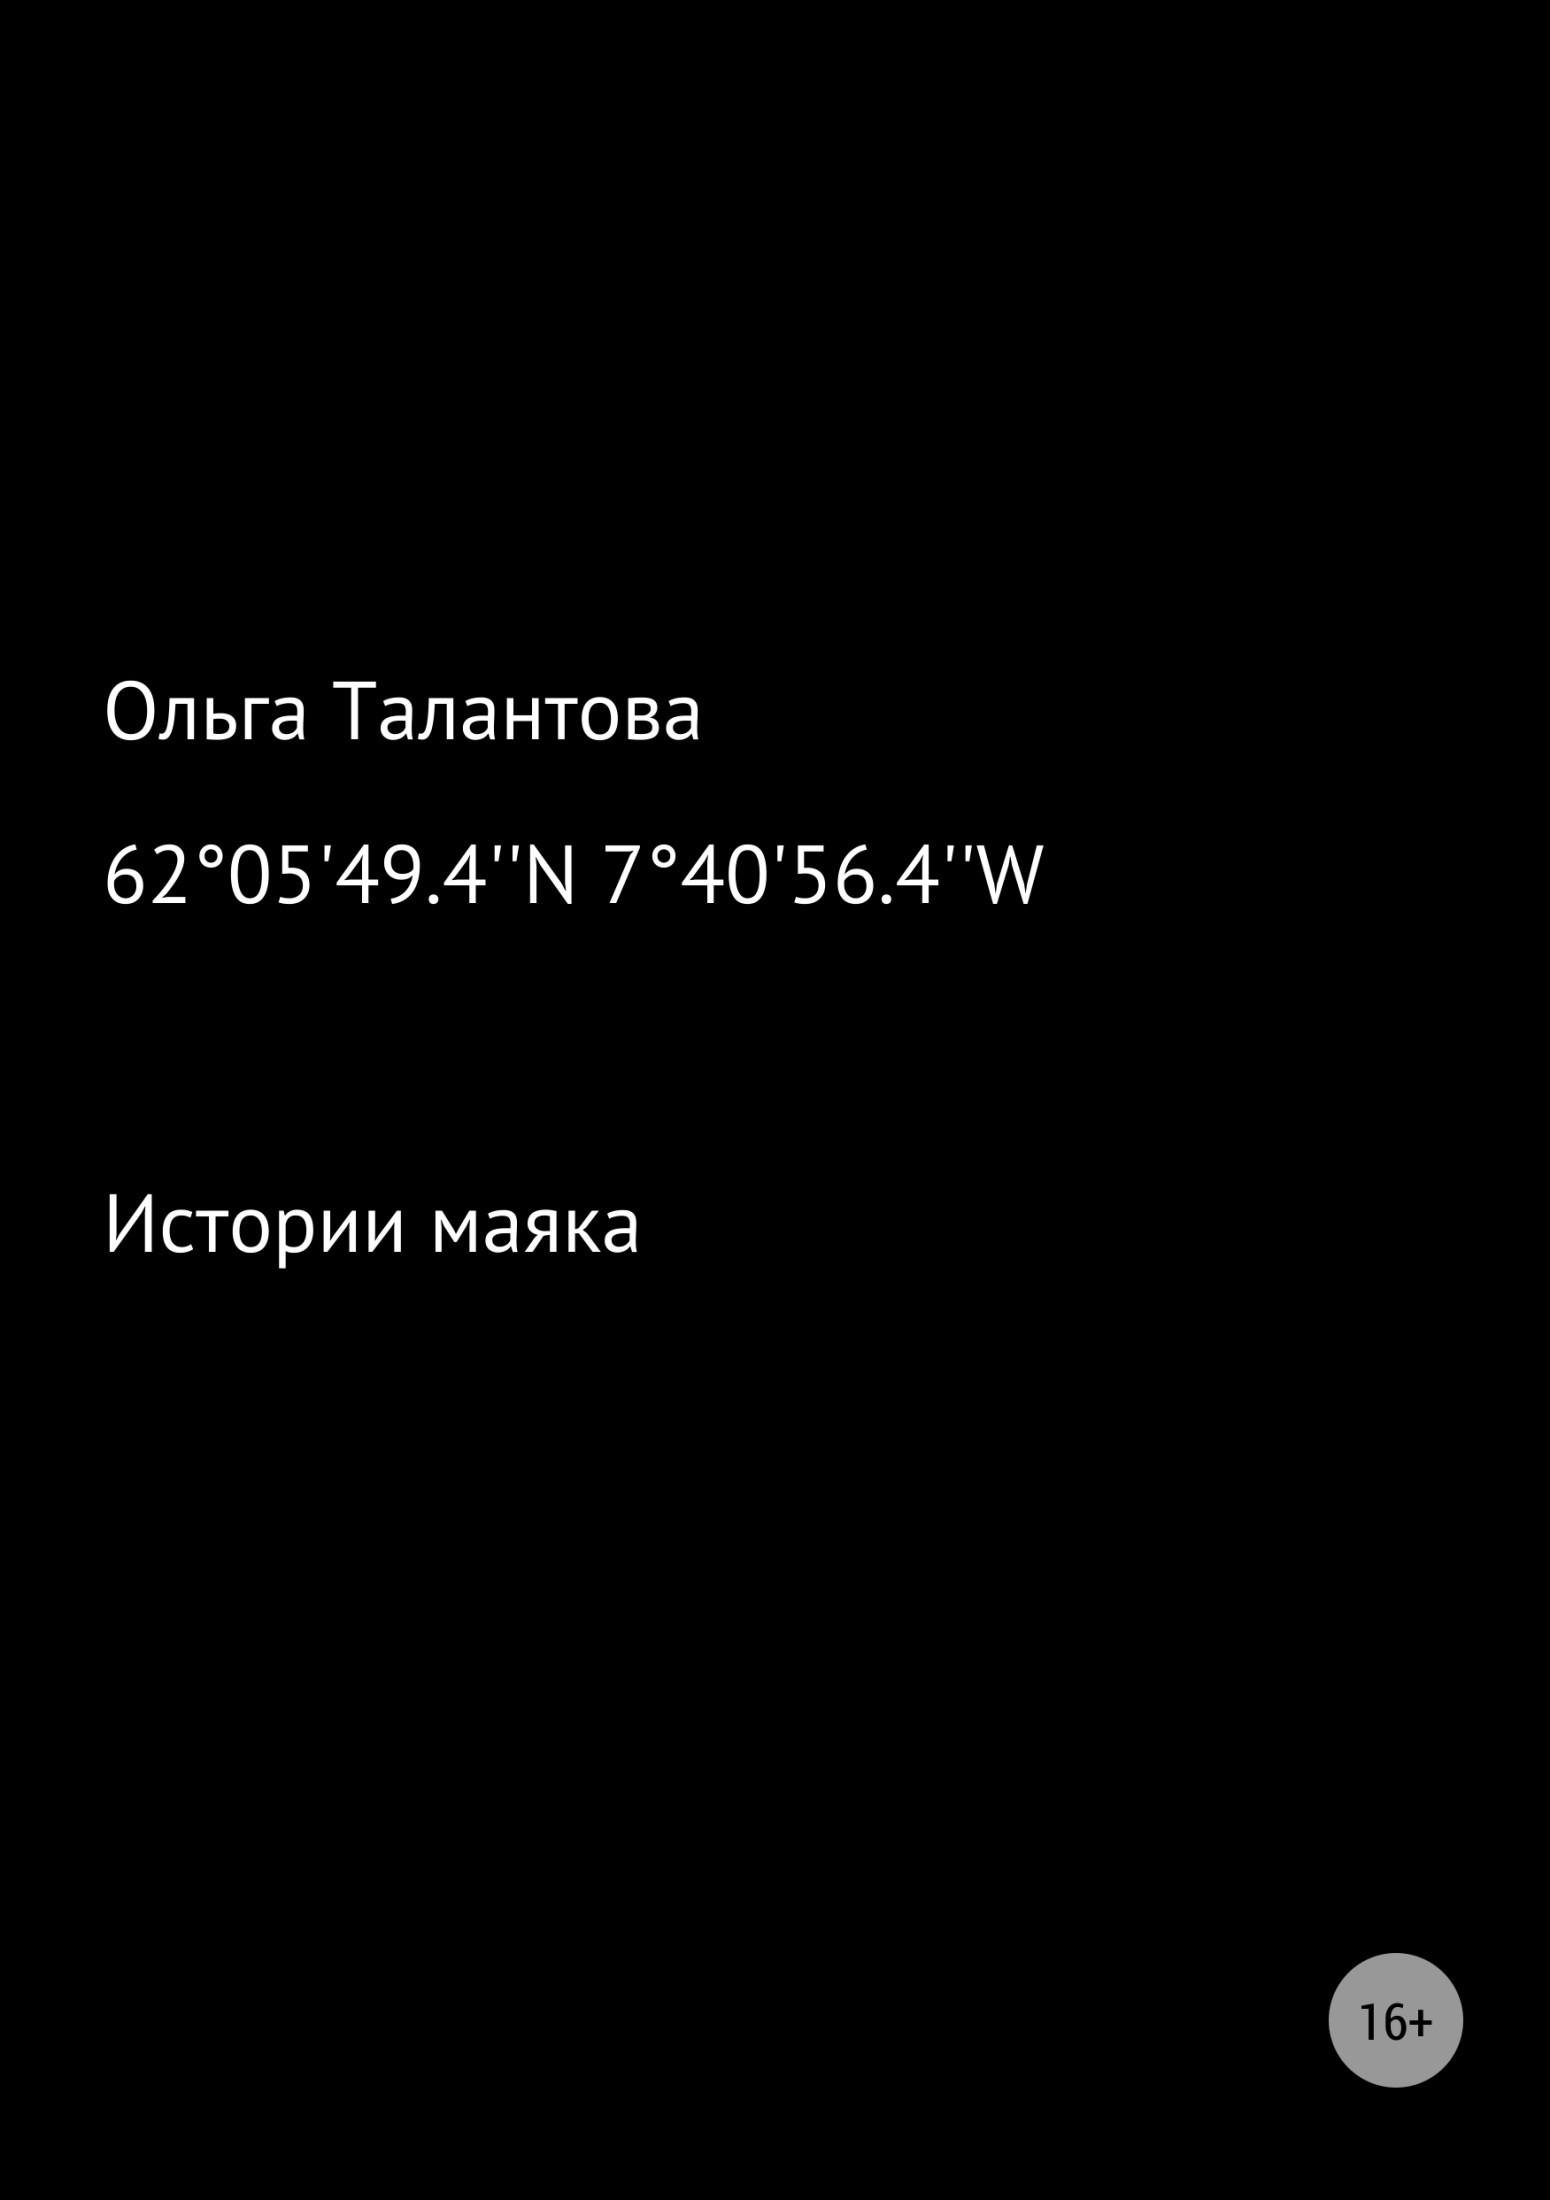 Ольга Талантова Истории маяка 62°05'49.4''N 7°40'56.4''W 360 degree rotating protective litchi pattern case w stand for google nexus 7 ii chocolate